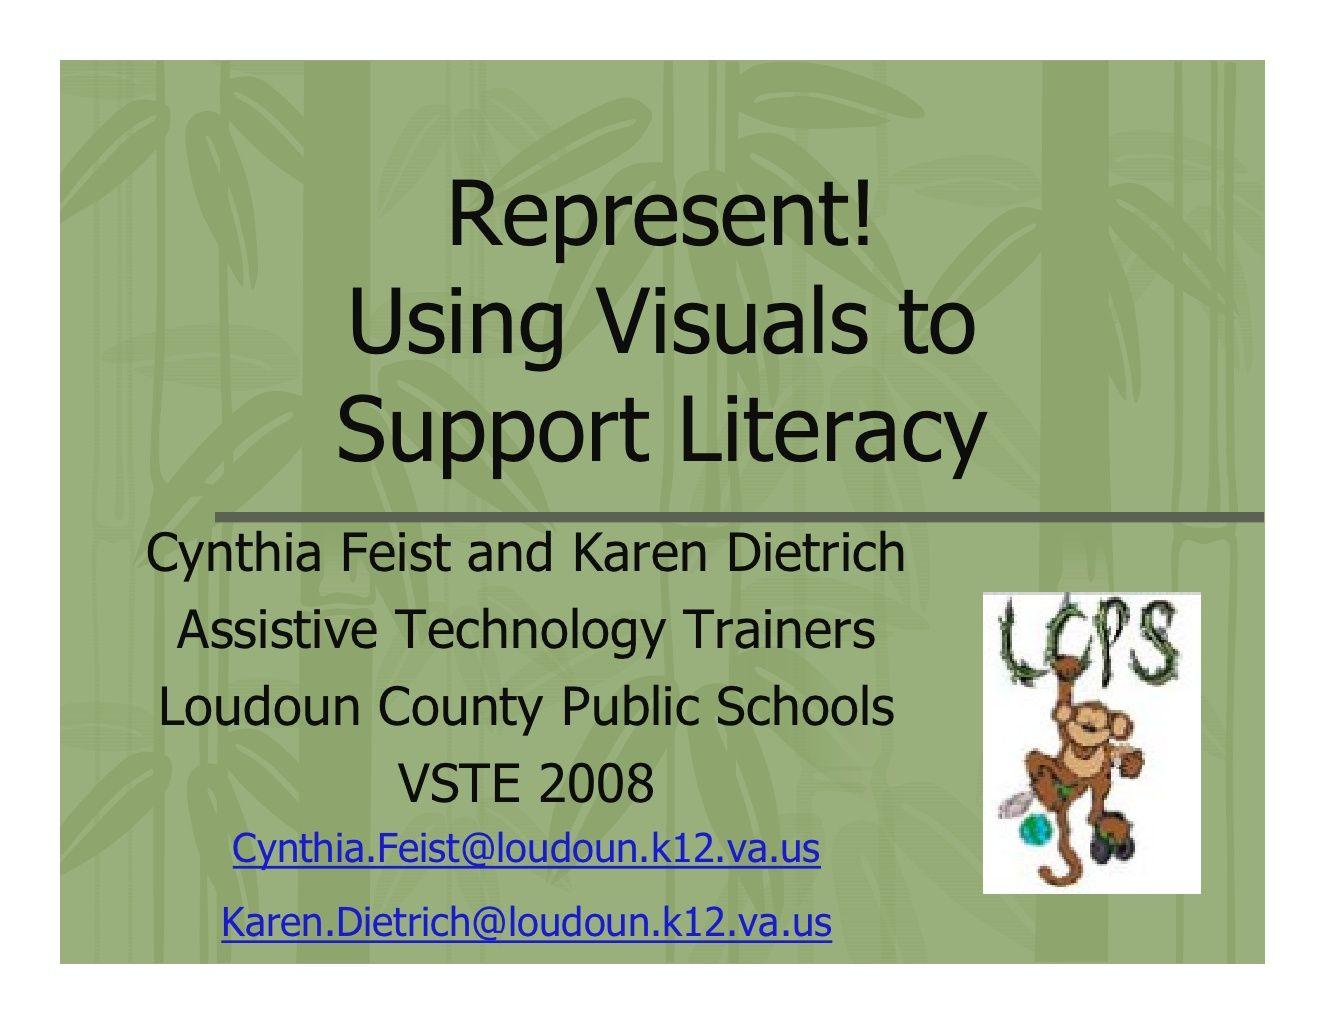 Represent using visuals to support literacy skills by tolbert using visuals to support literacy skills by tolbert elementary via slideshare stopboris Image collections